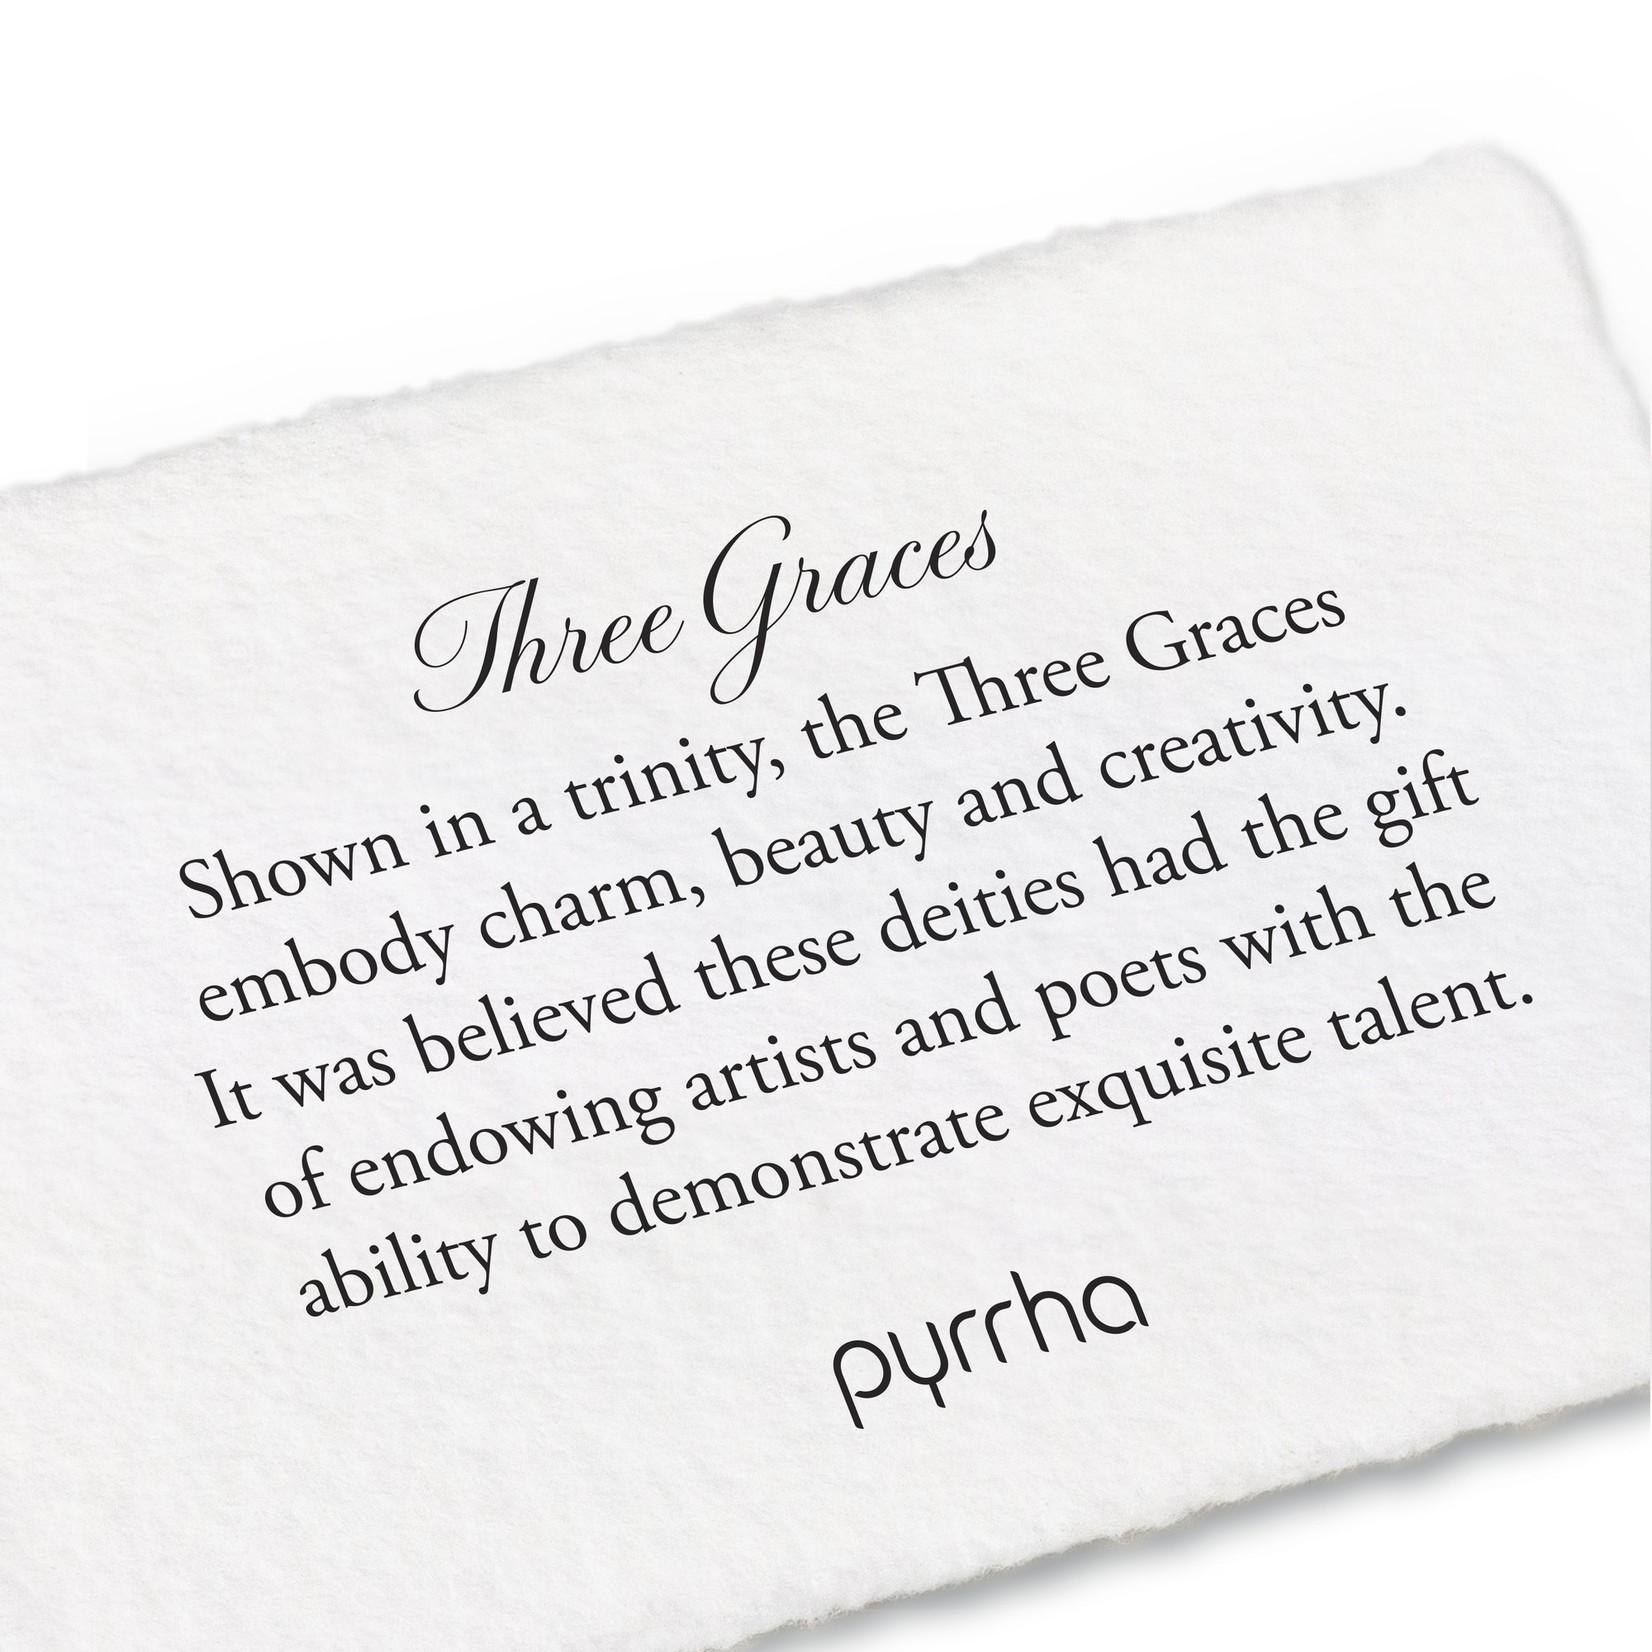 Pyrrha Small Three Graces Locket